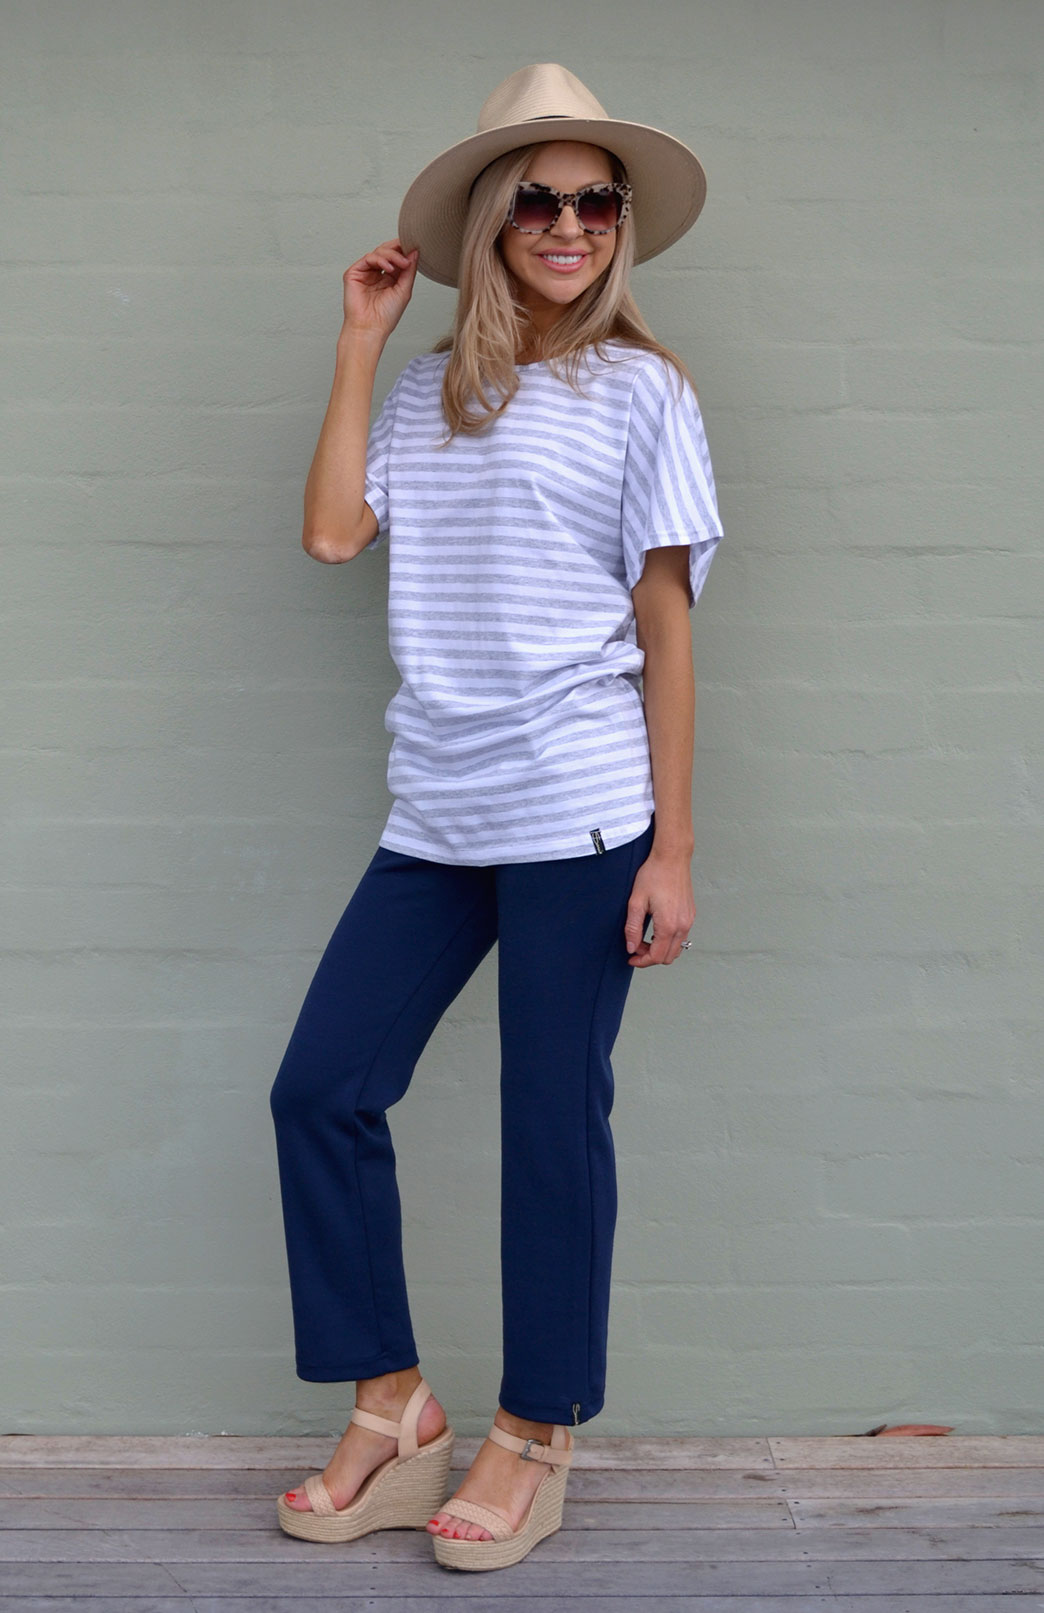 Loose T-Shirt - Cotton - Women's Striped Cotton Loose T-Shirt - Smitten Merino Tasmania Australia